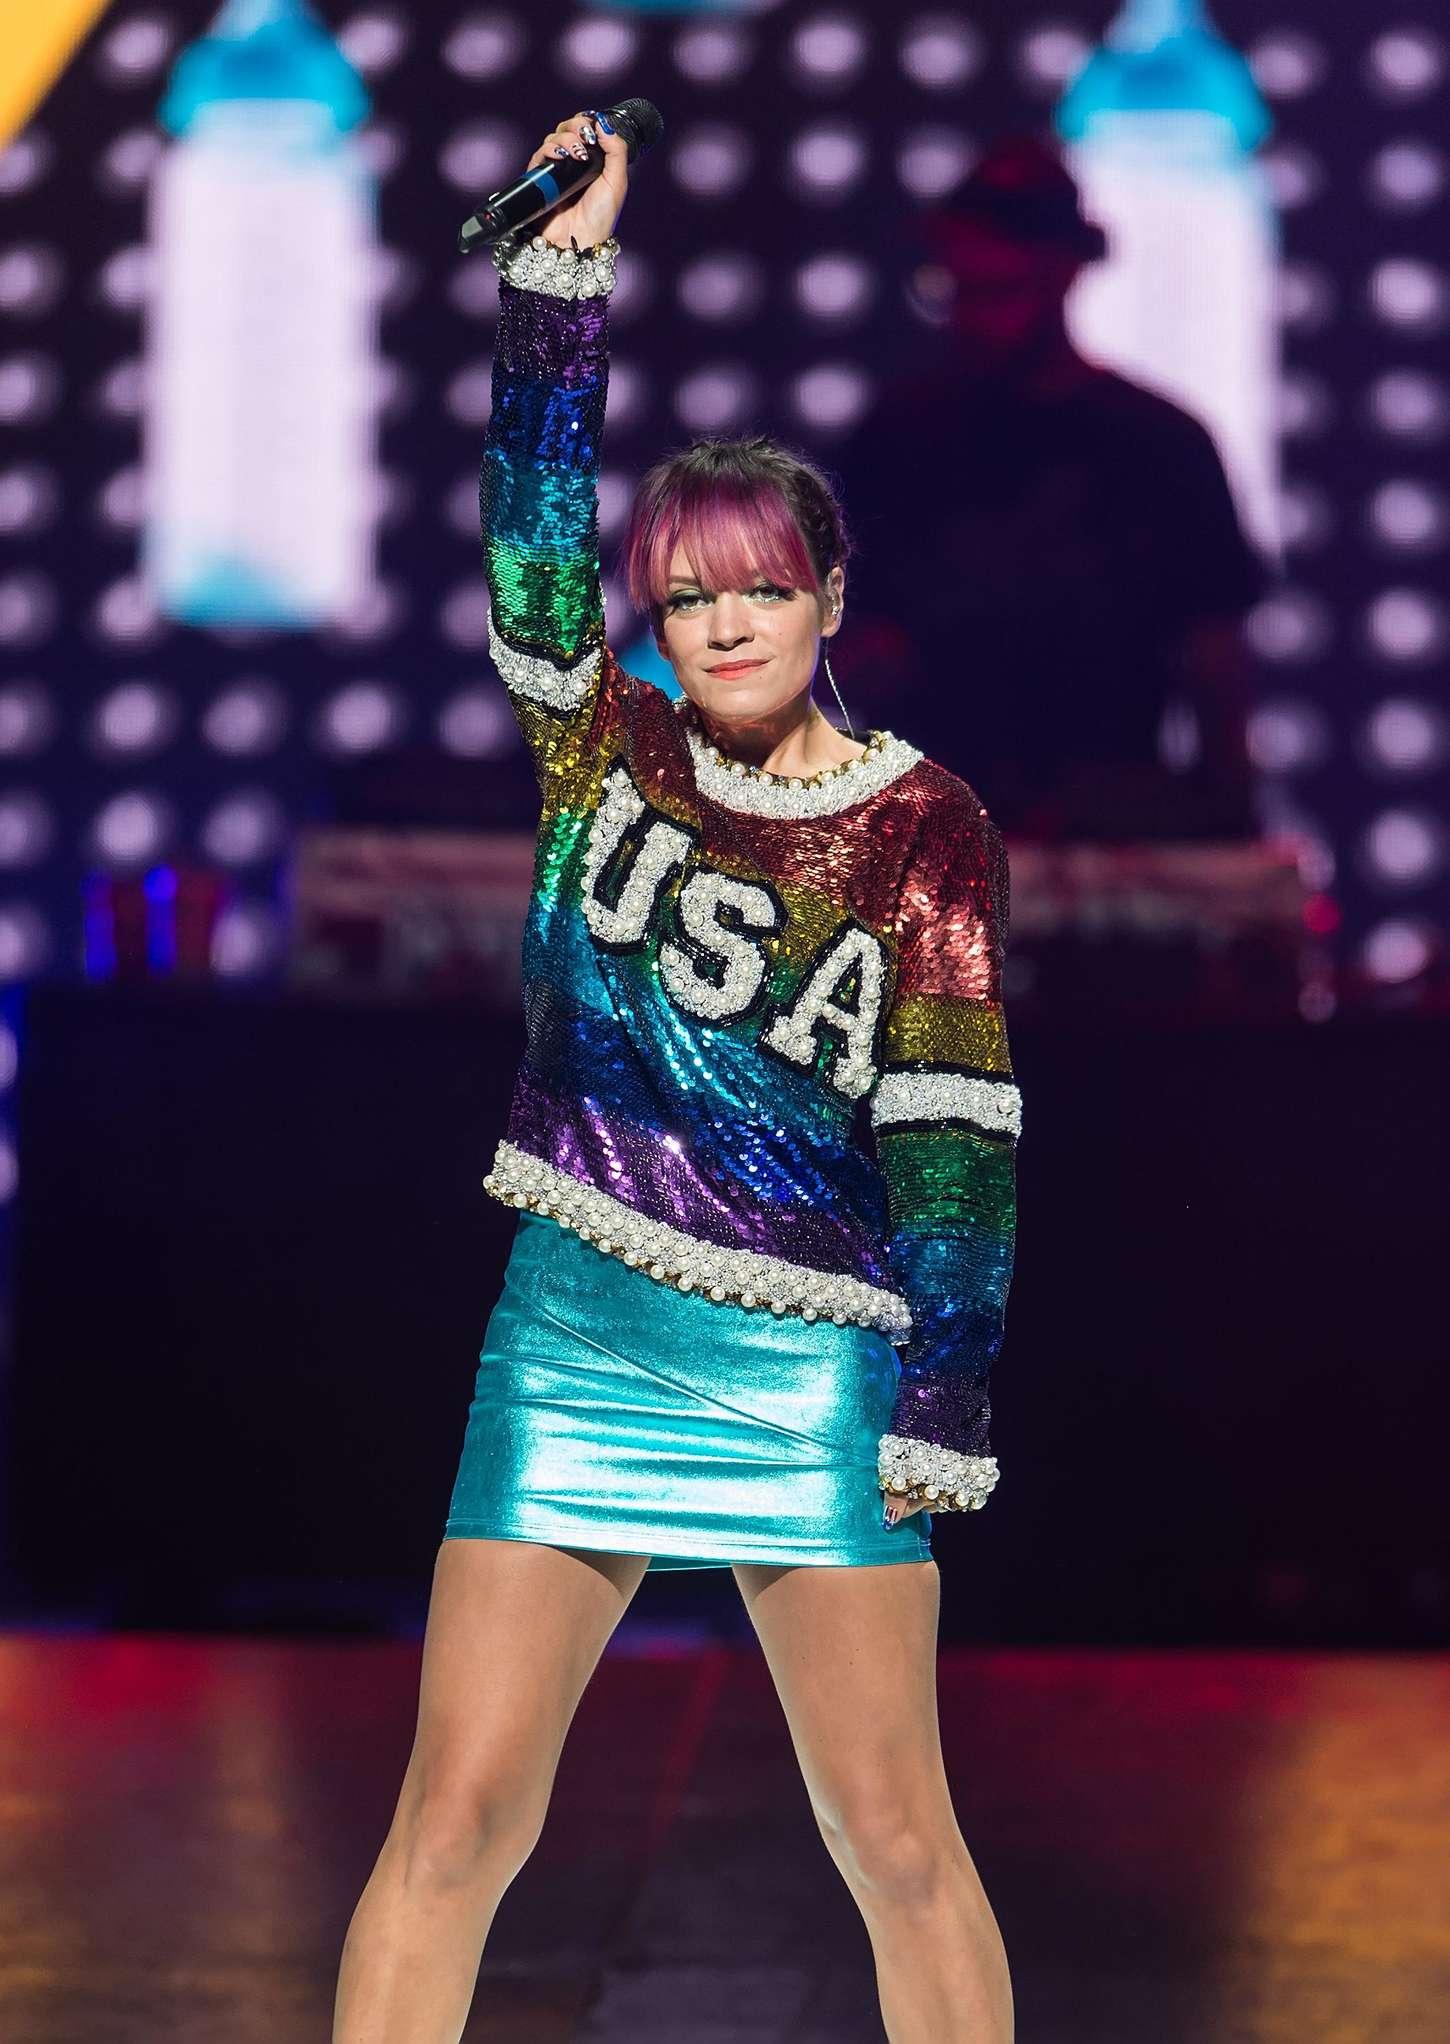 Lily Allen 2014 : Lily Allen Performs Live in Philadelphia -04